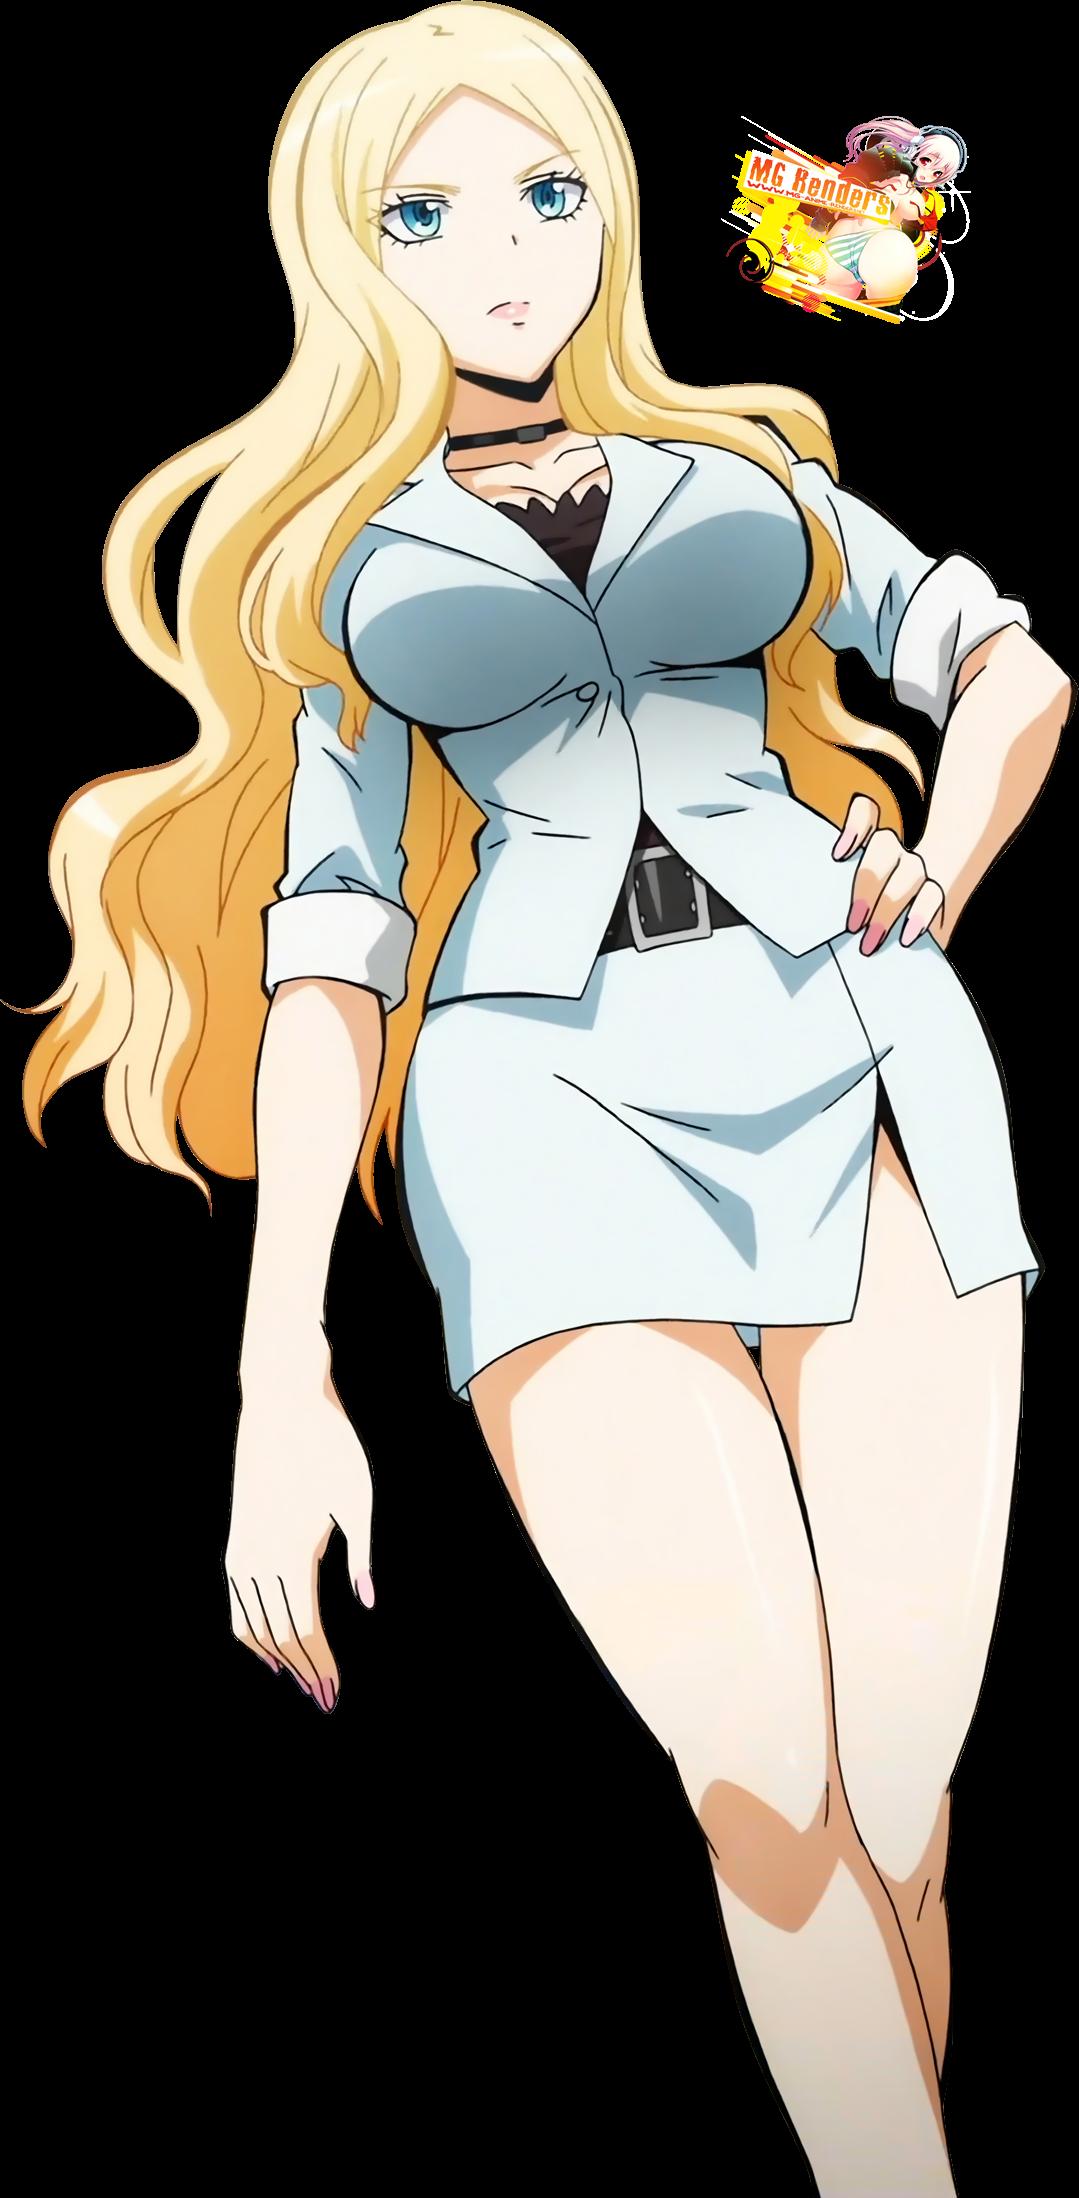 Ansatsu Kyoushitsu - Irina Jelavic Render 2 - Anime - PNG